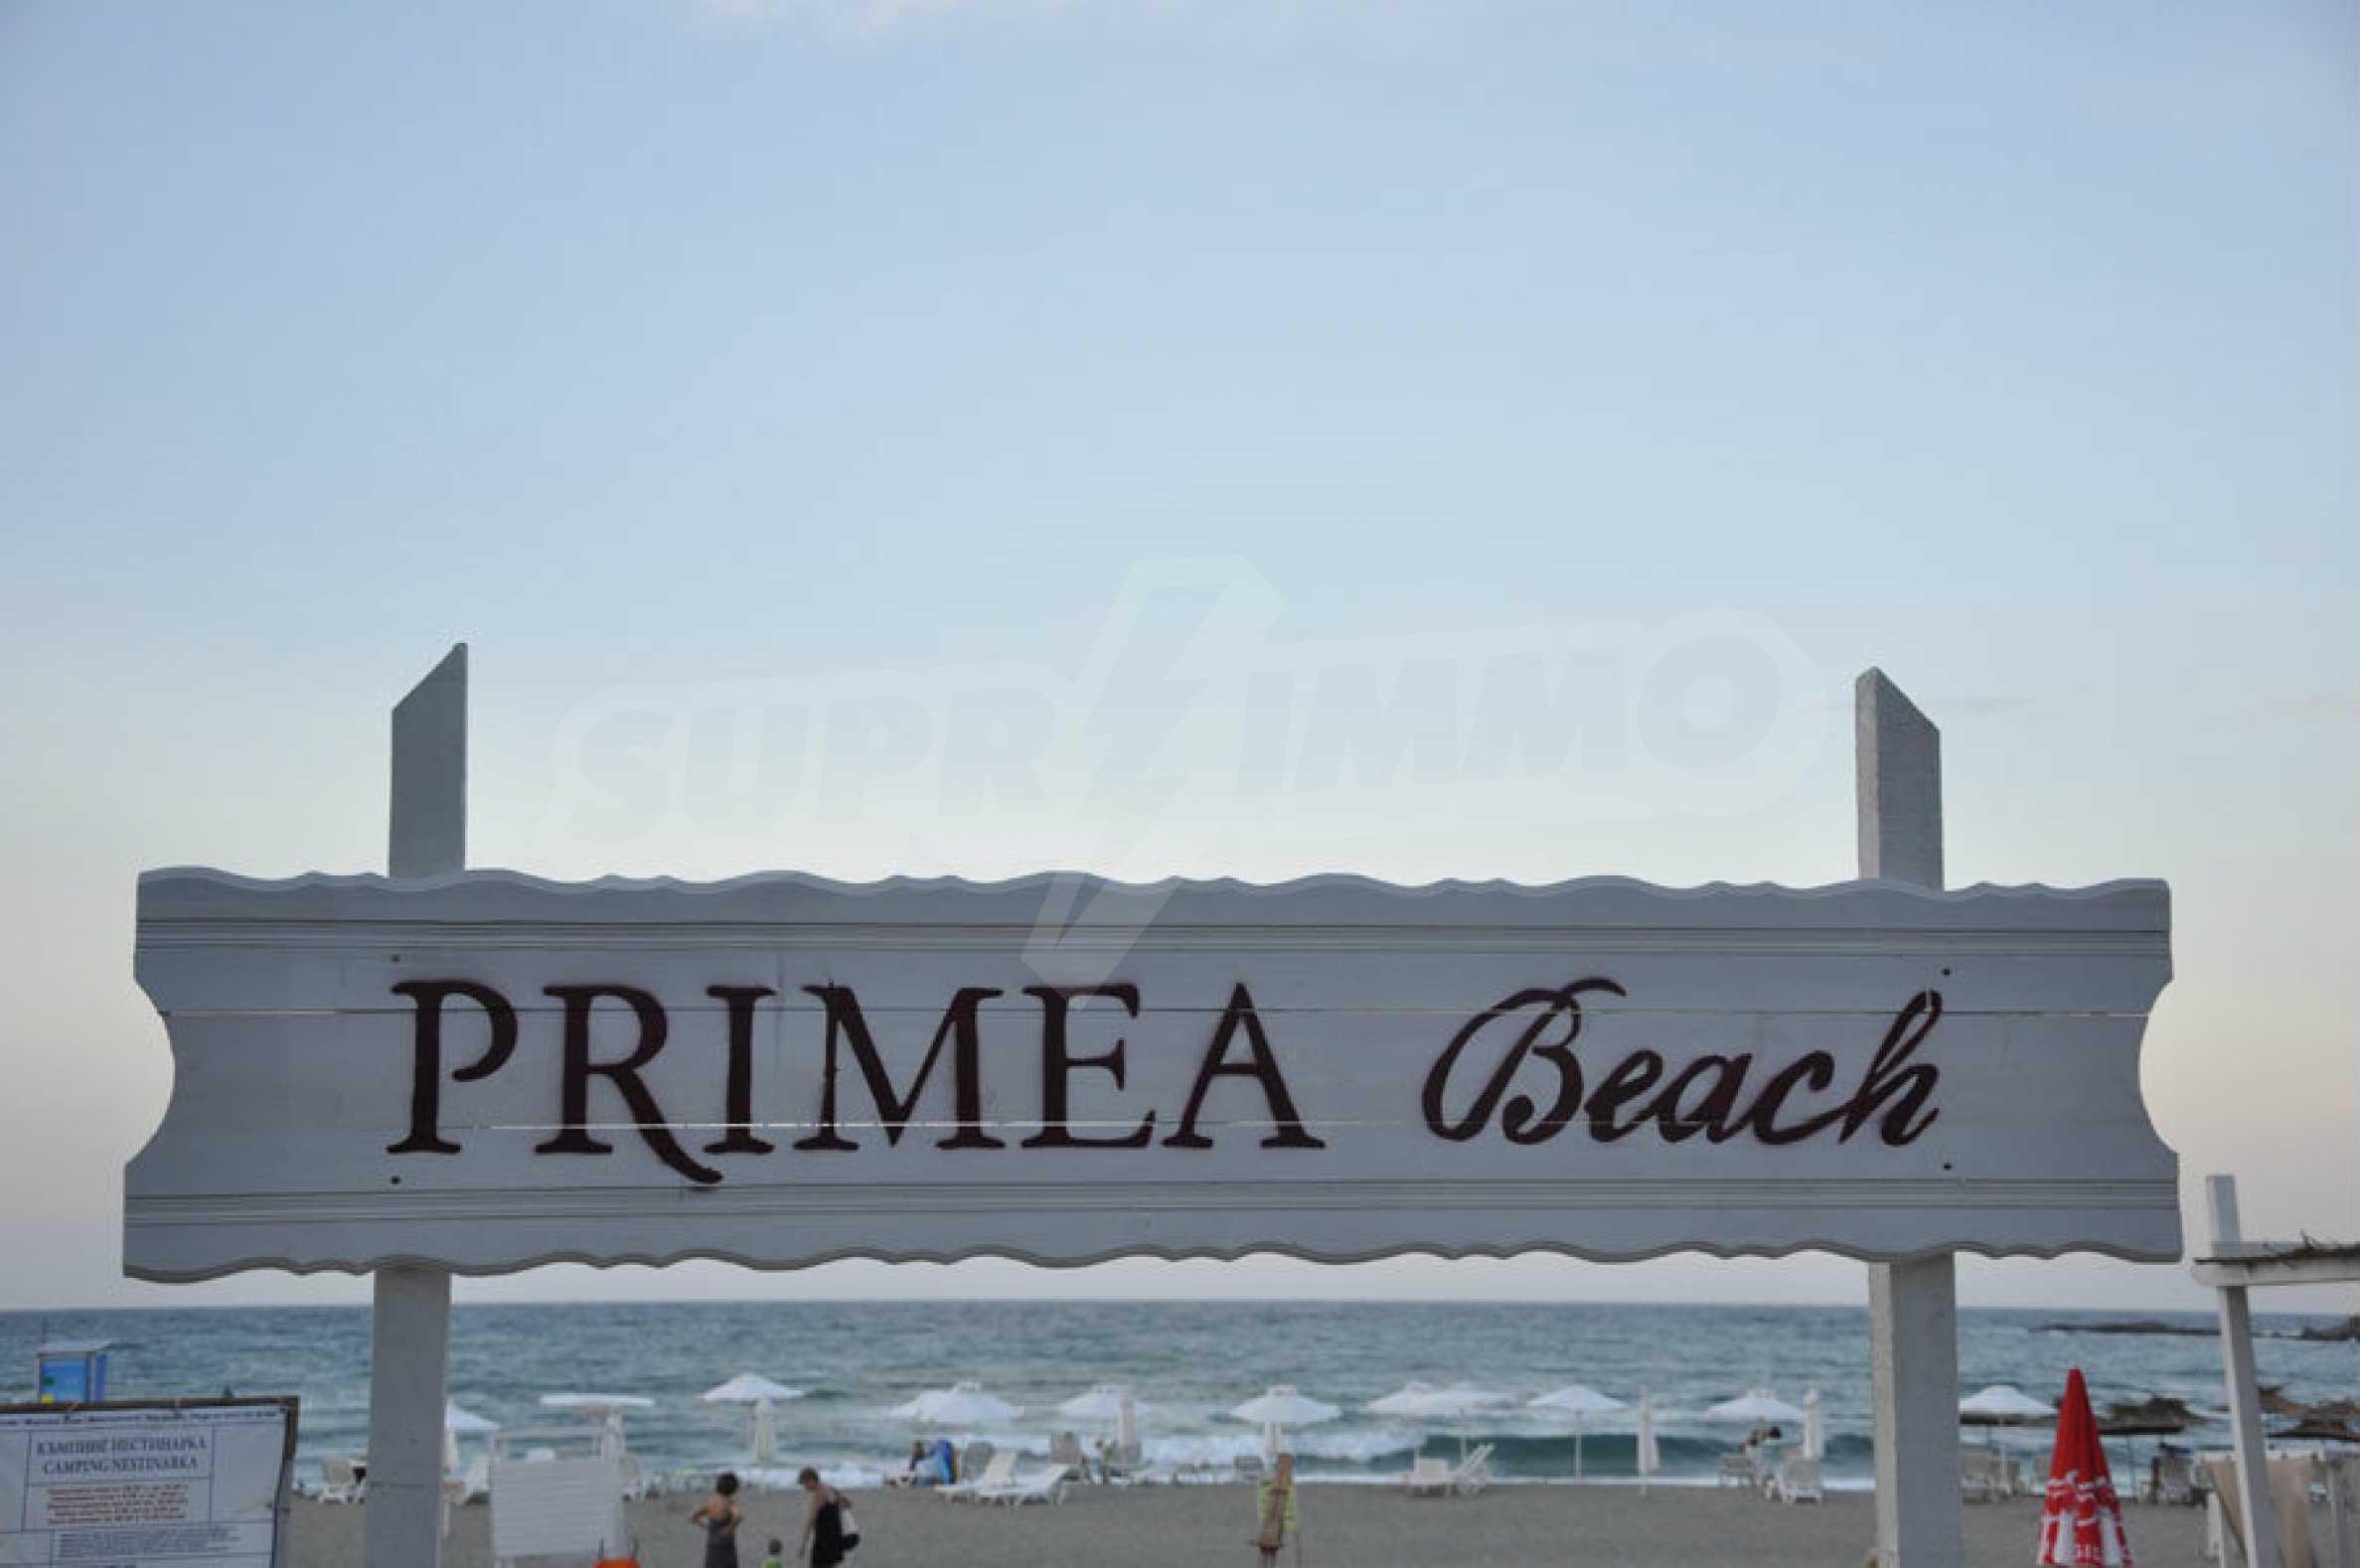 Примеа Бийч Резиденс / Primea Beach Residence 20